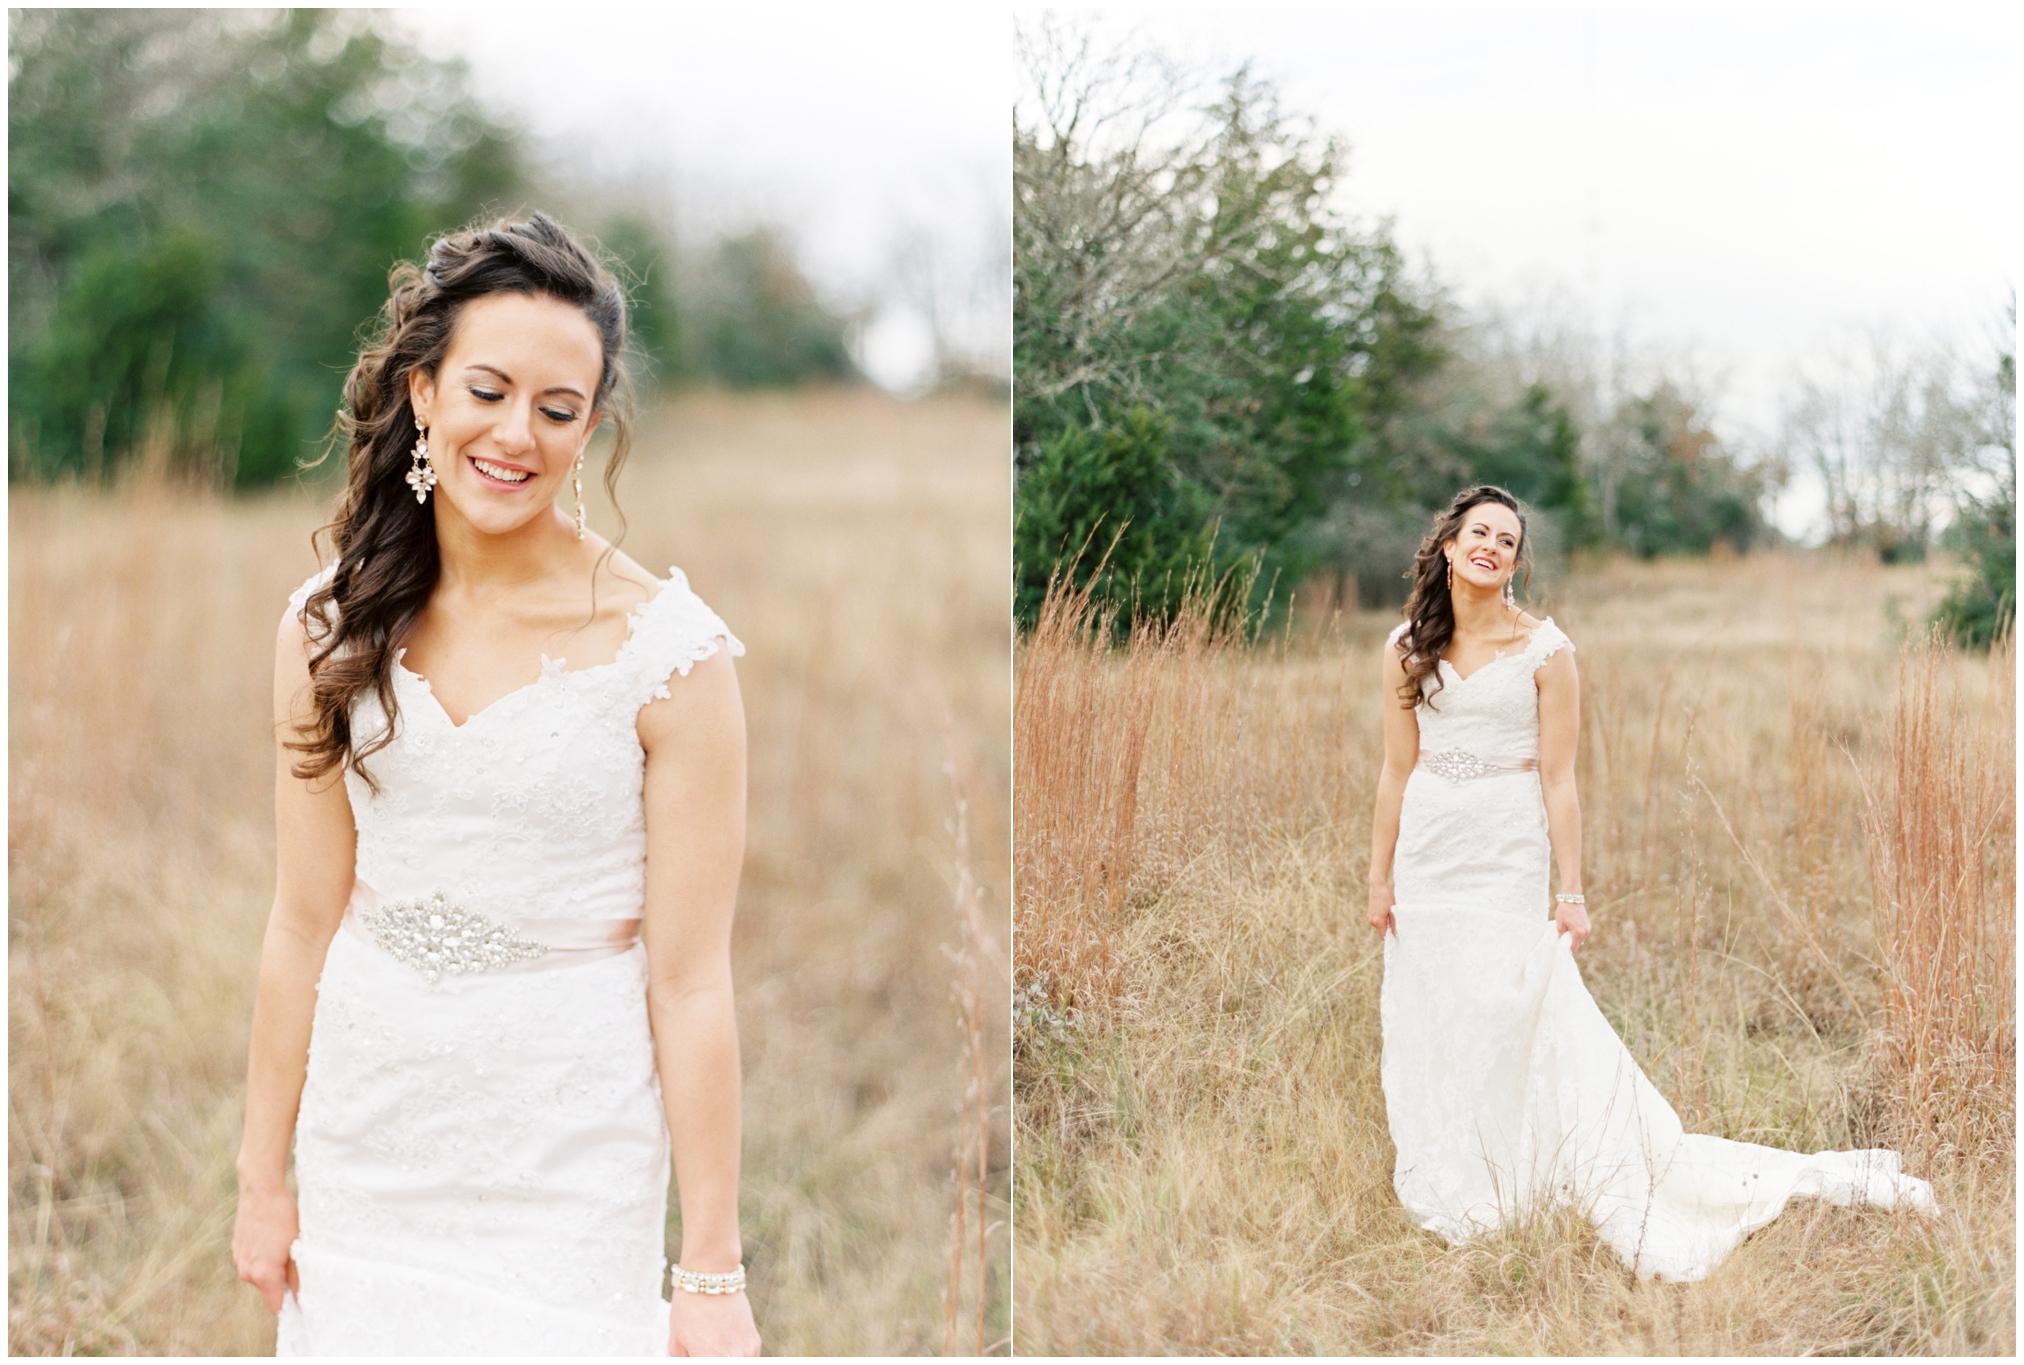 Sarah Best Photography - Emily's Bridals-125_STP.jpg